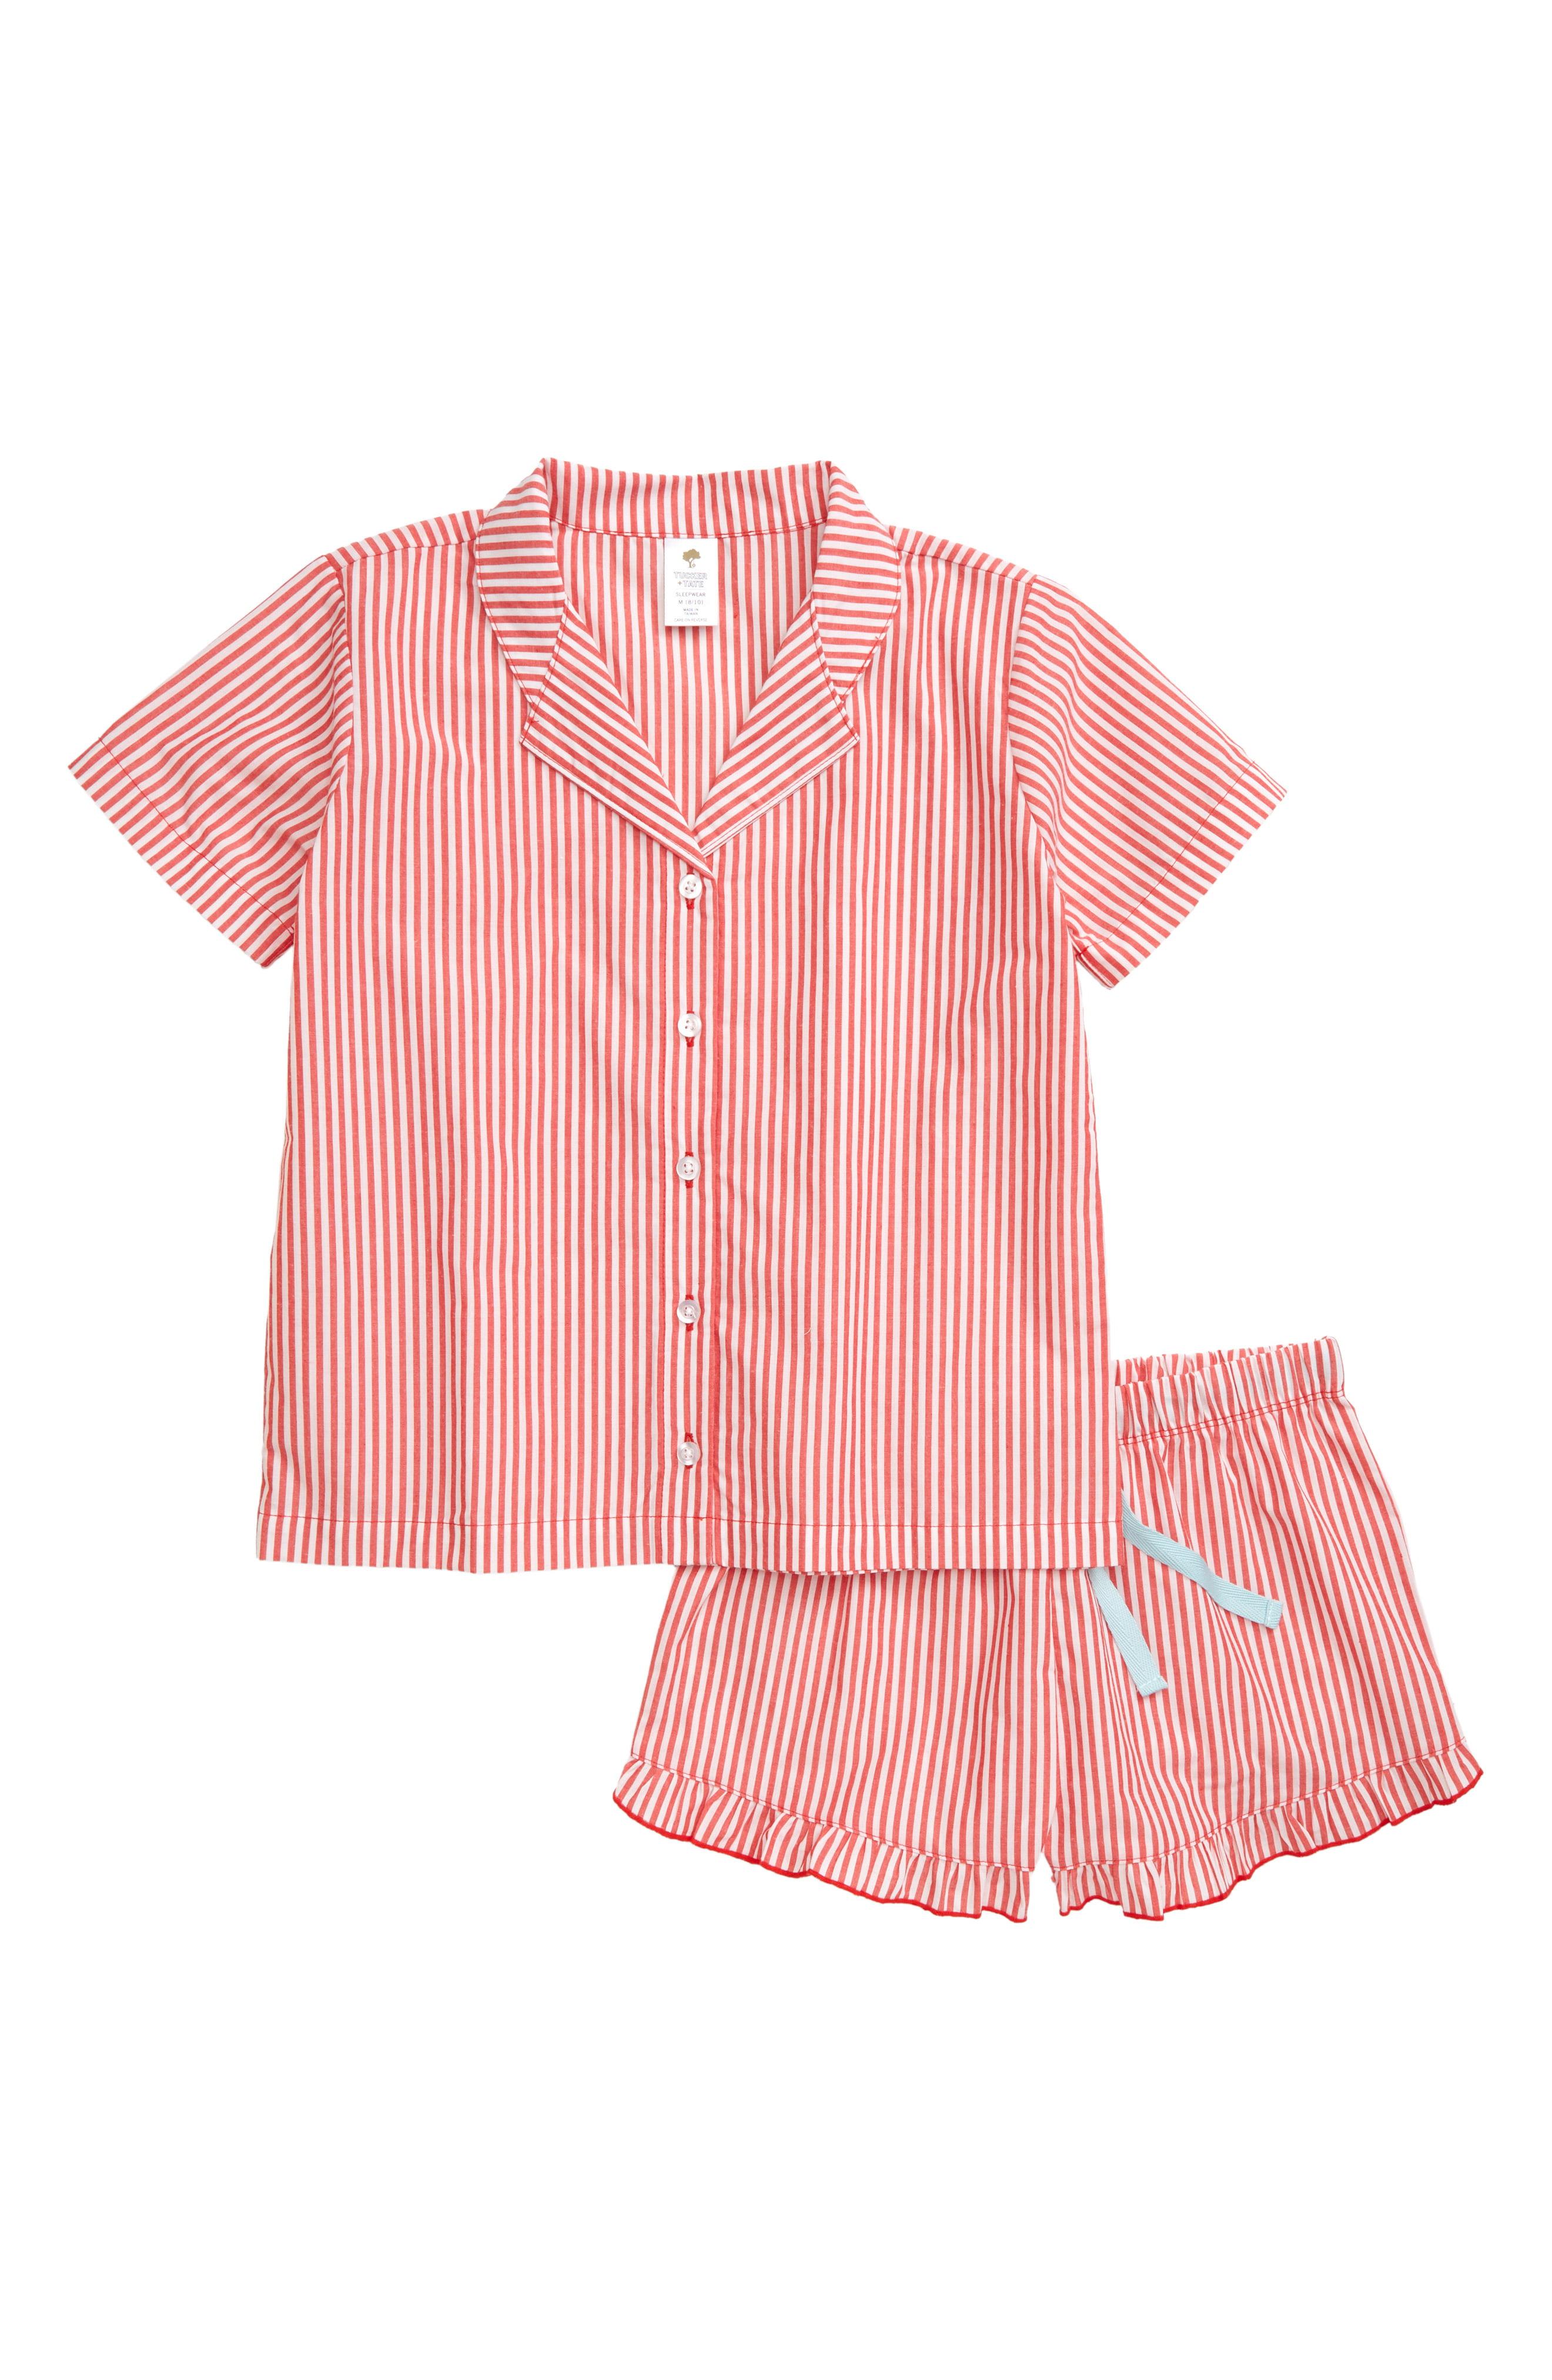 Pajamas clipart onesie pajama. Girls robes sleepwear nordstrom